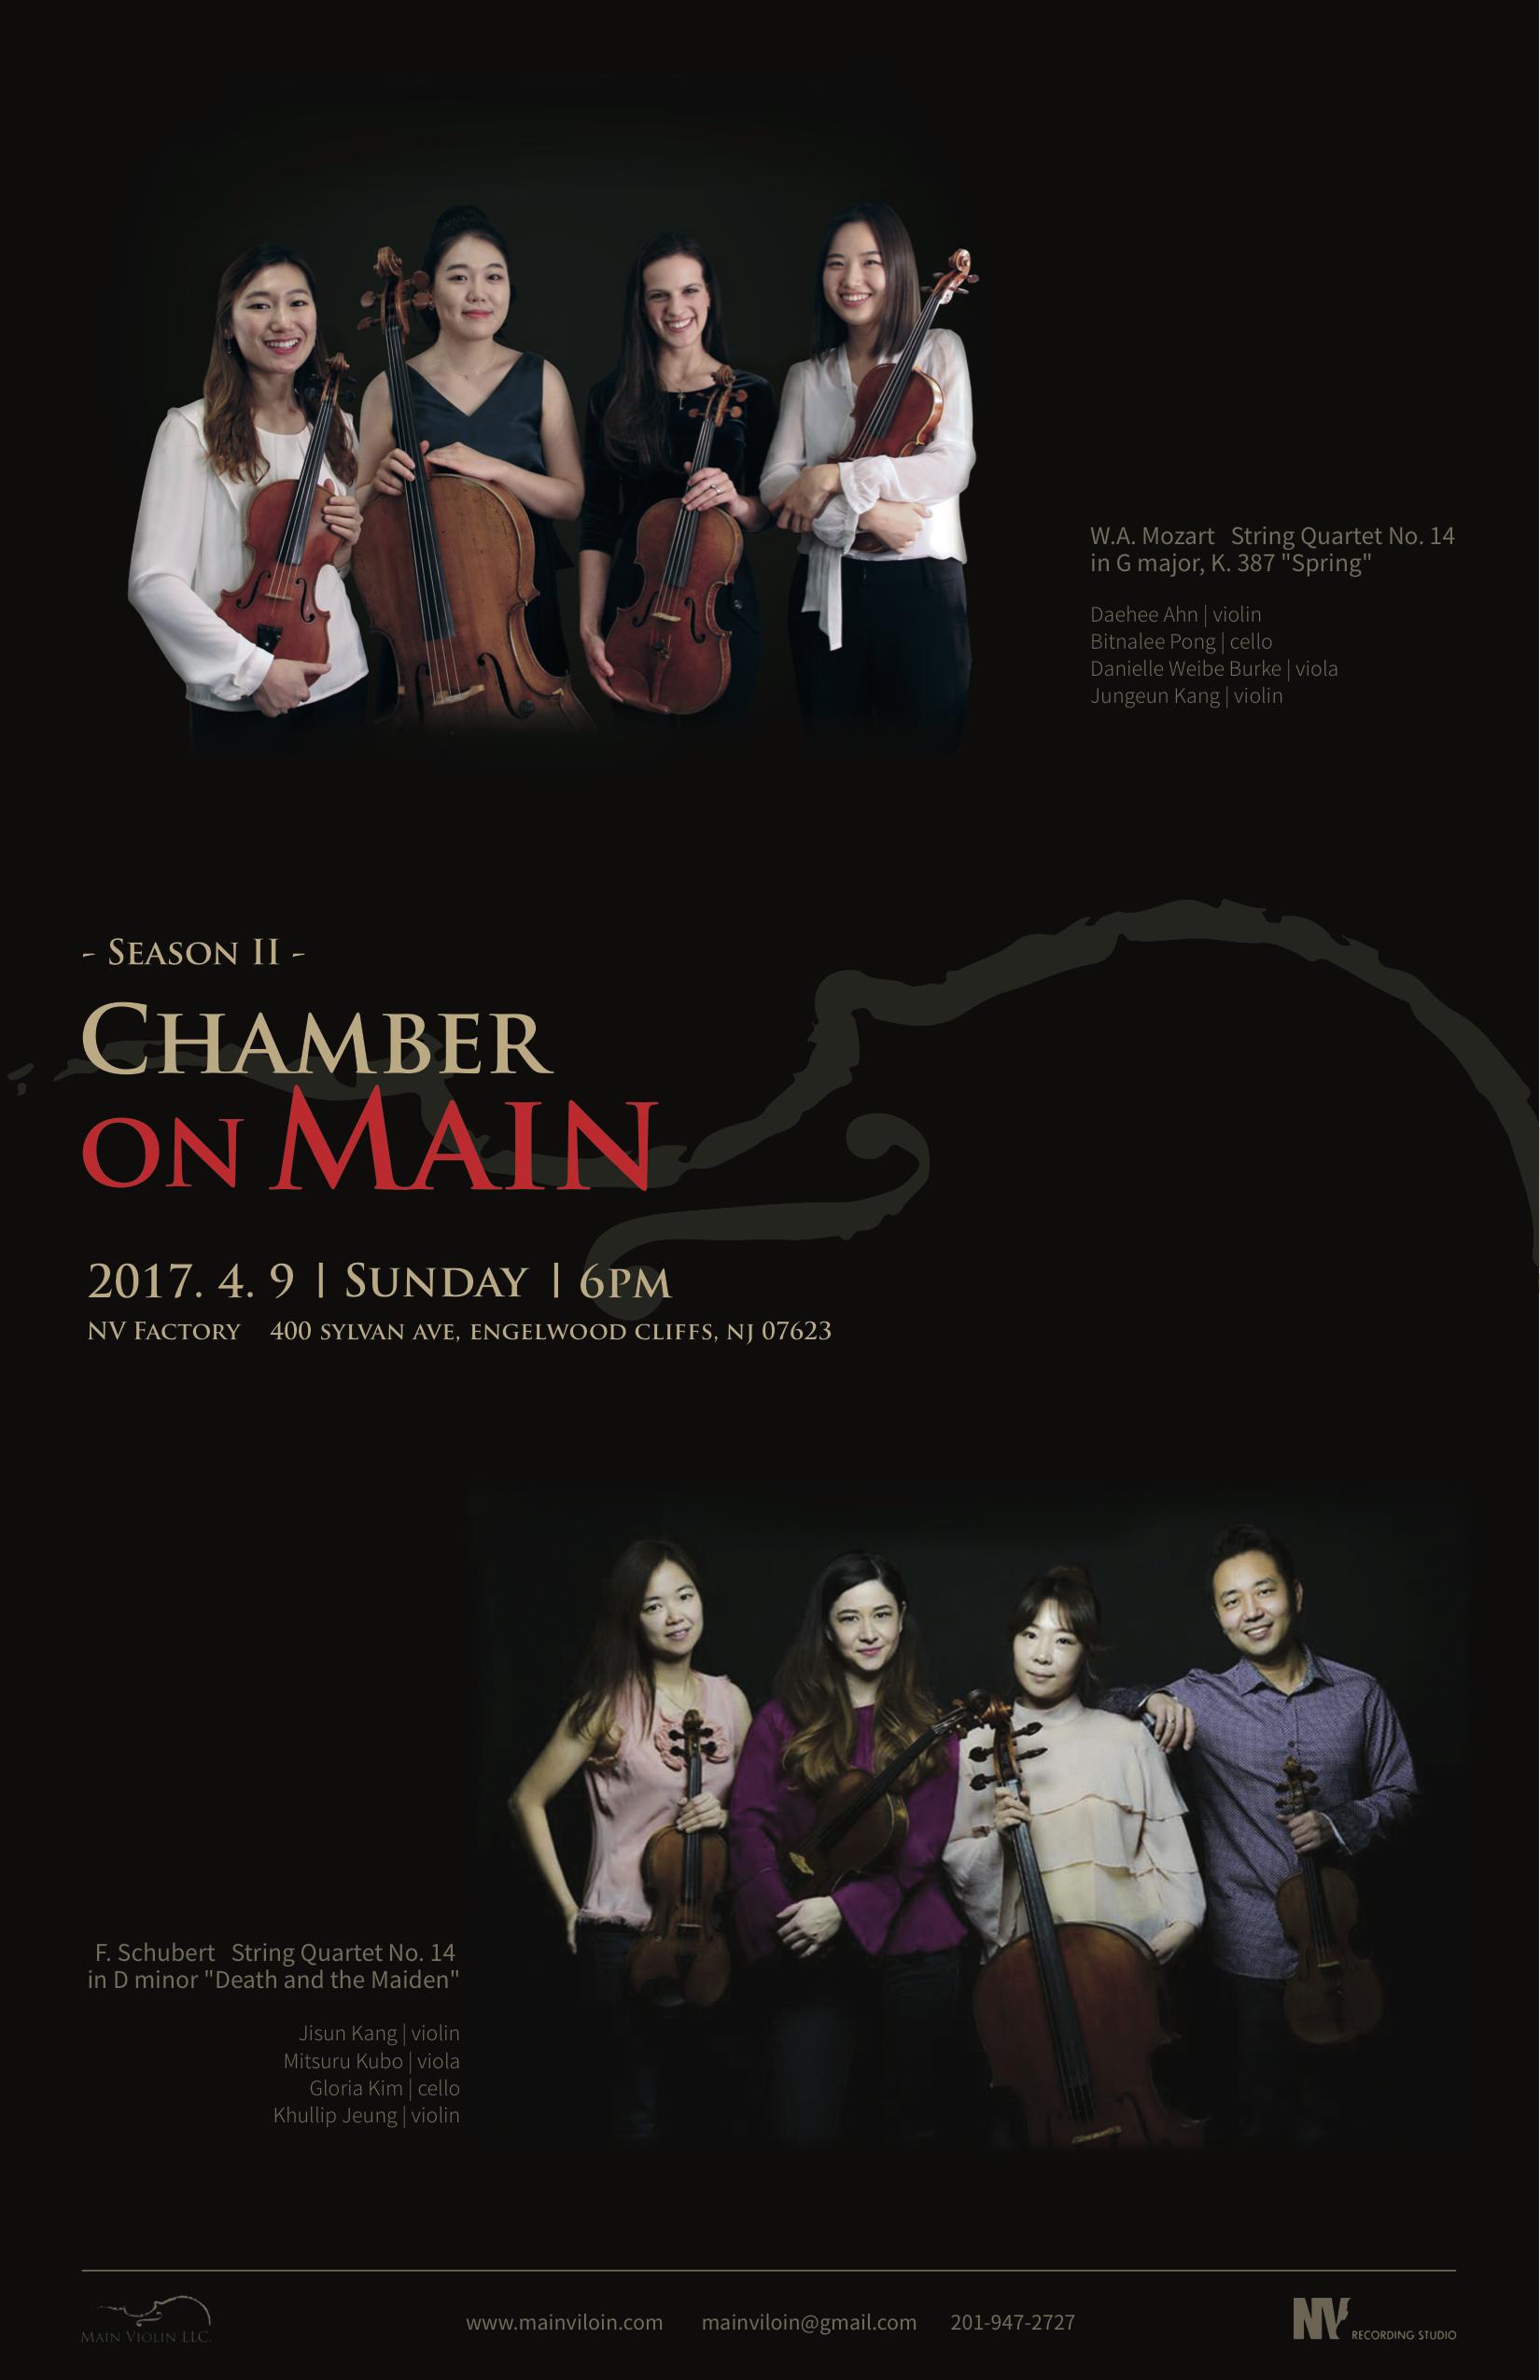 Main Violin Final